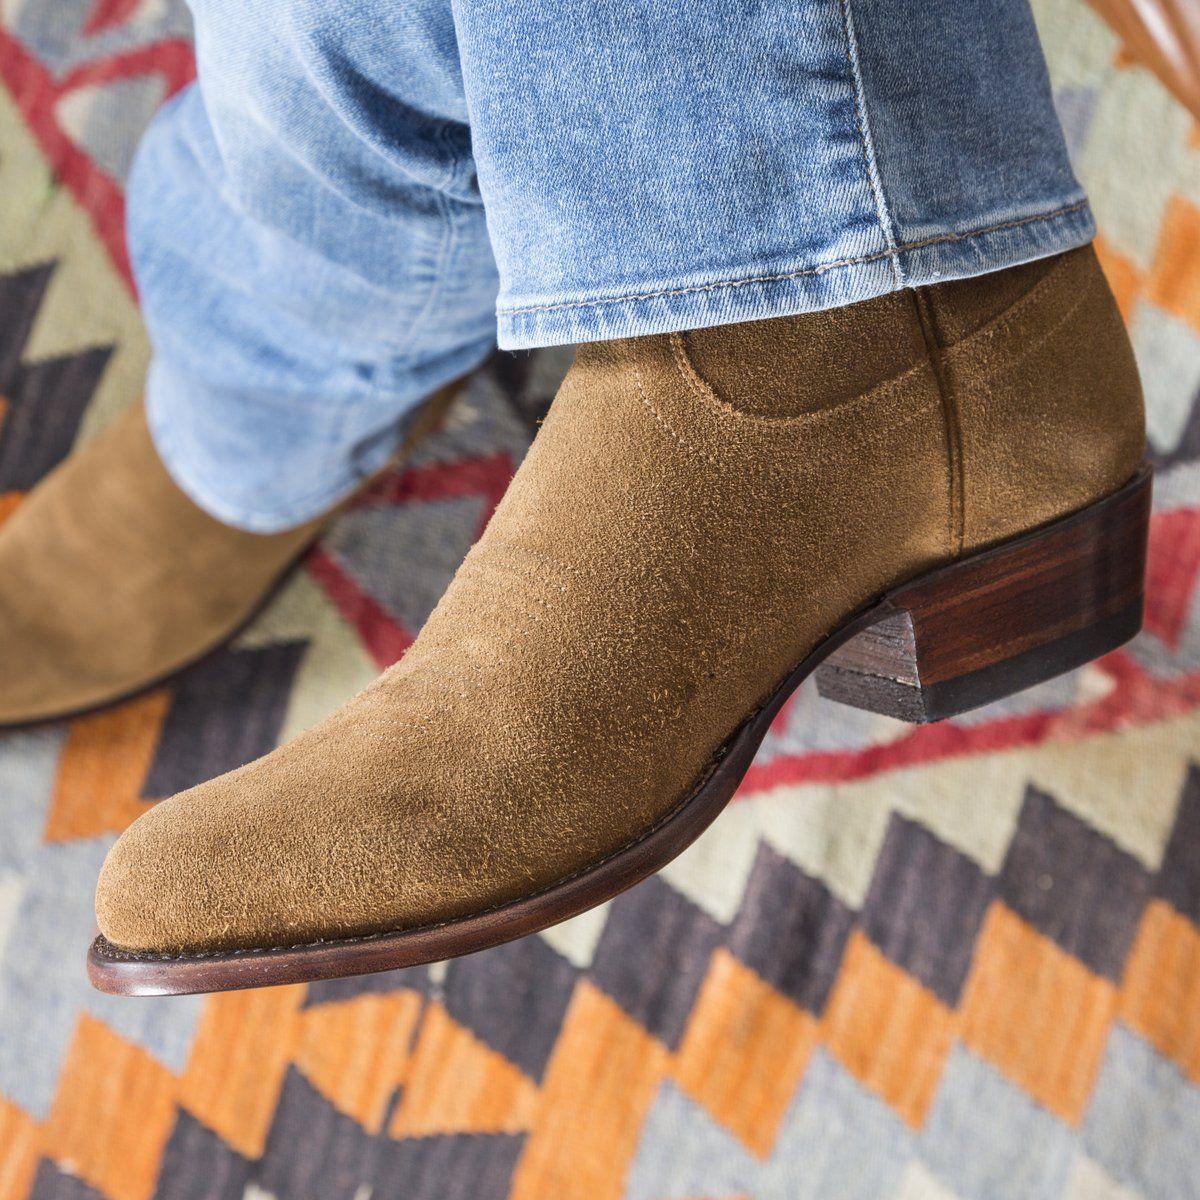 Suede cowboy boots, Mens suede boots